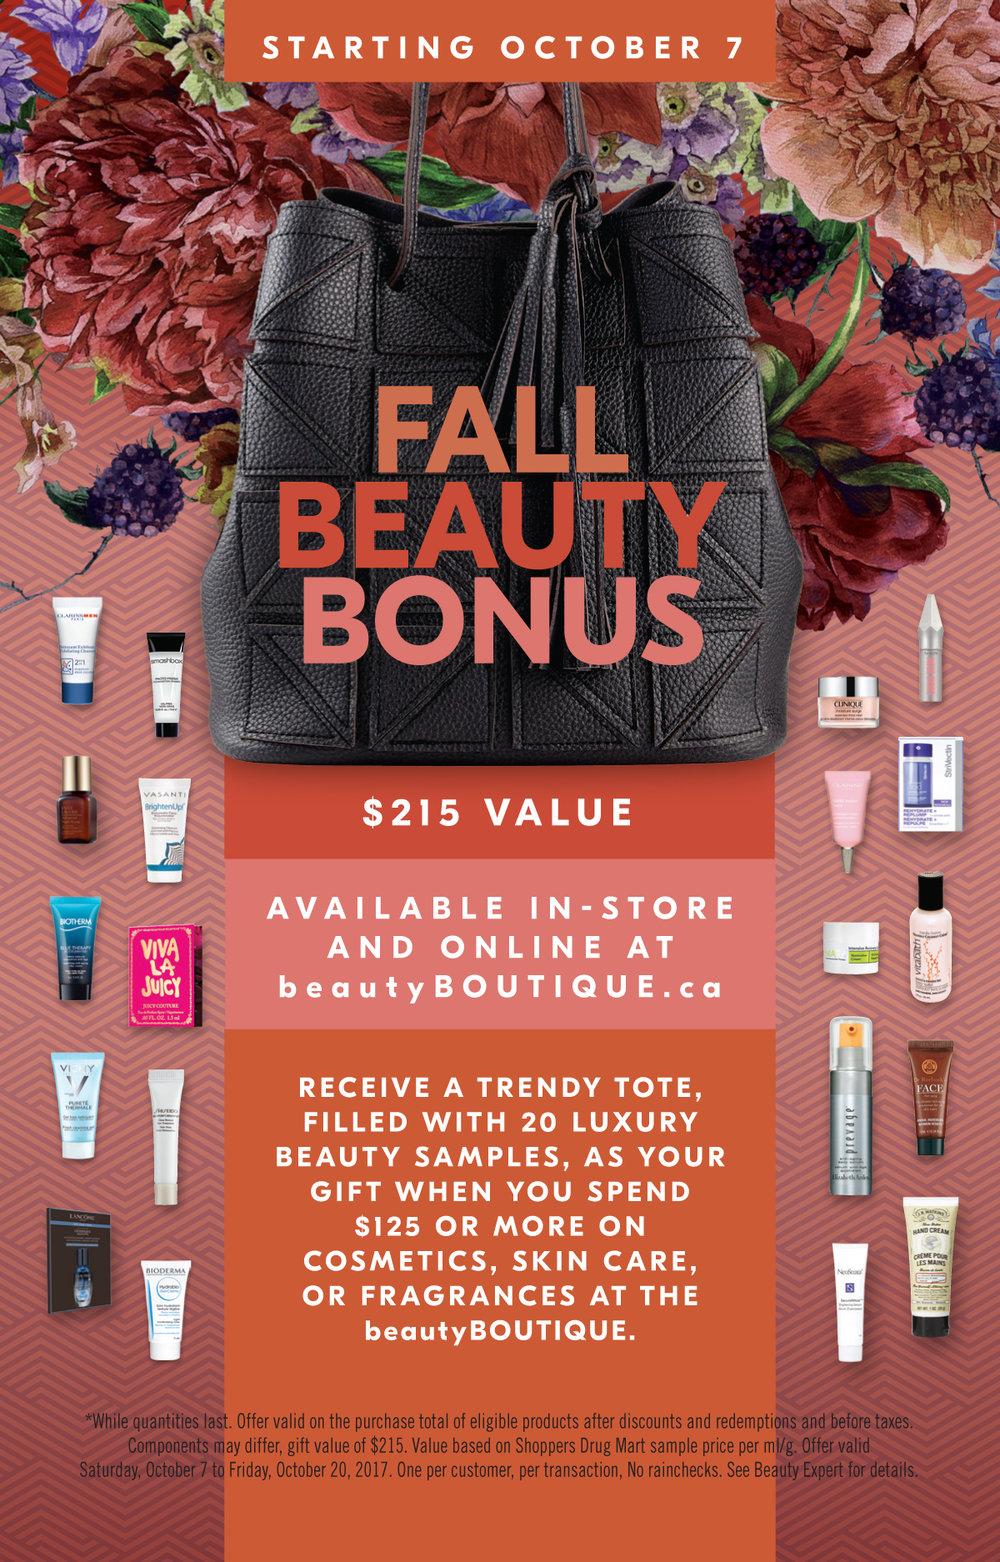 Shoppers Drug Mart Fall Beauty Bonus Counter Card 4 x 6.5